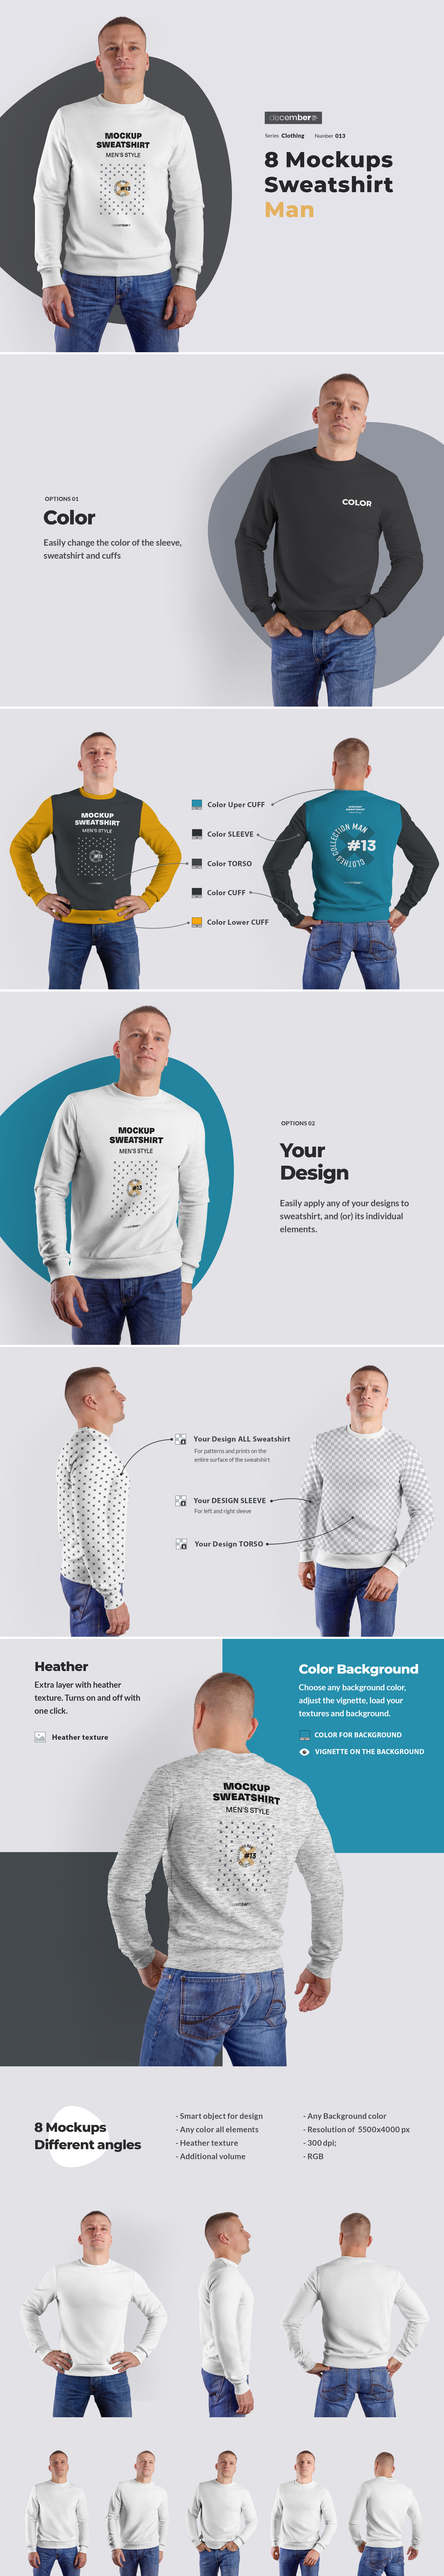 8 Mockups Mens Sweatshirt